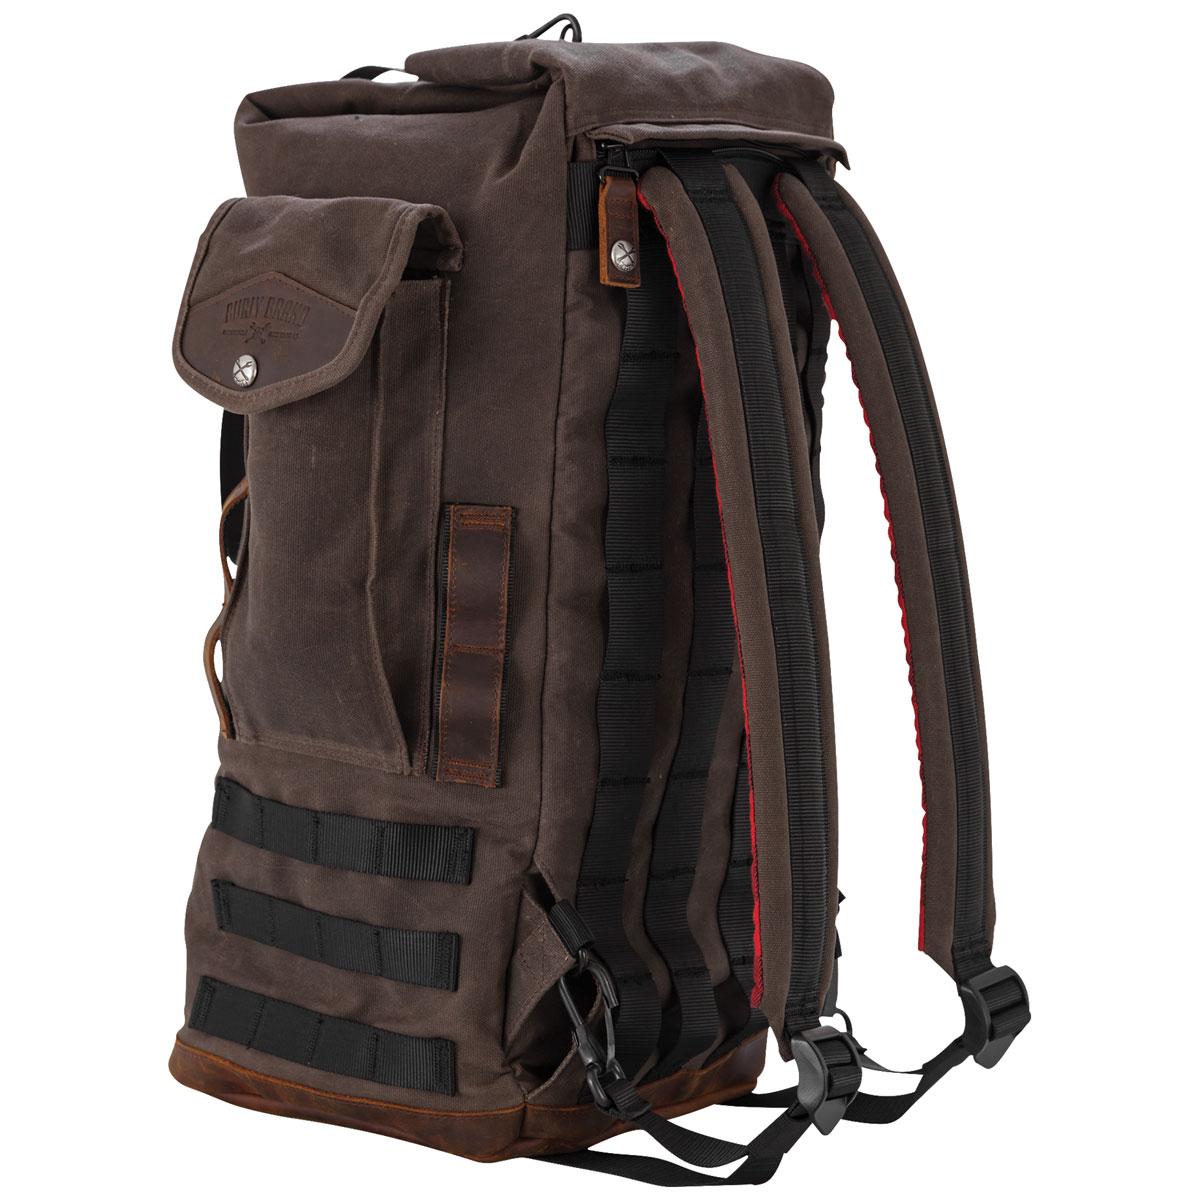 Burly Brand Voyager Voyager Dark Oak Sissy Bar Backpack